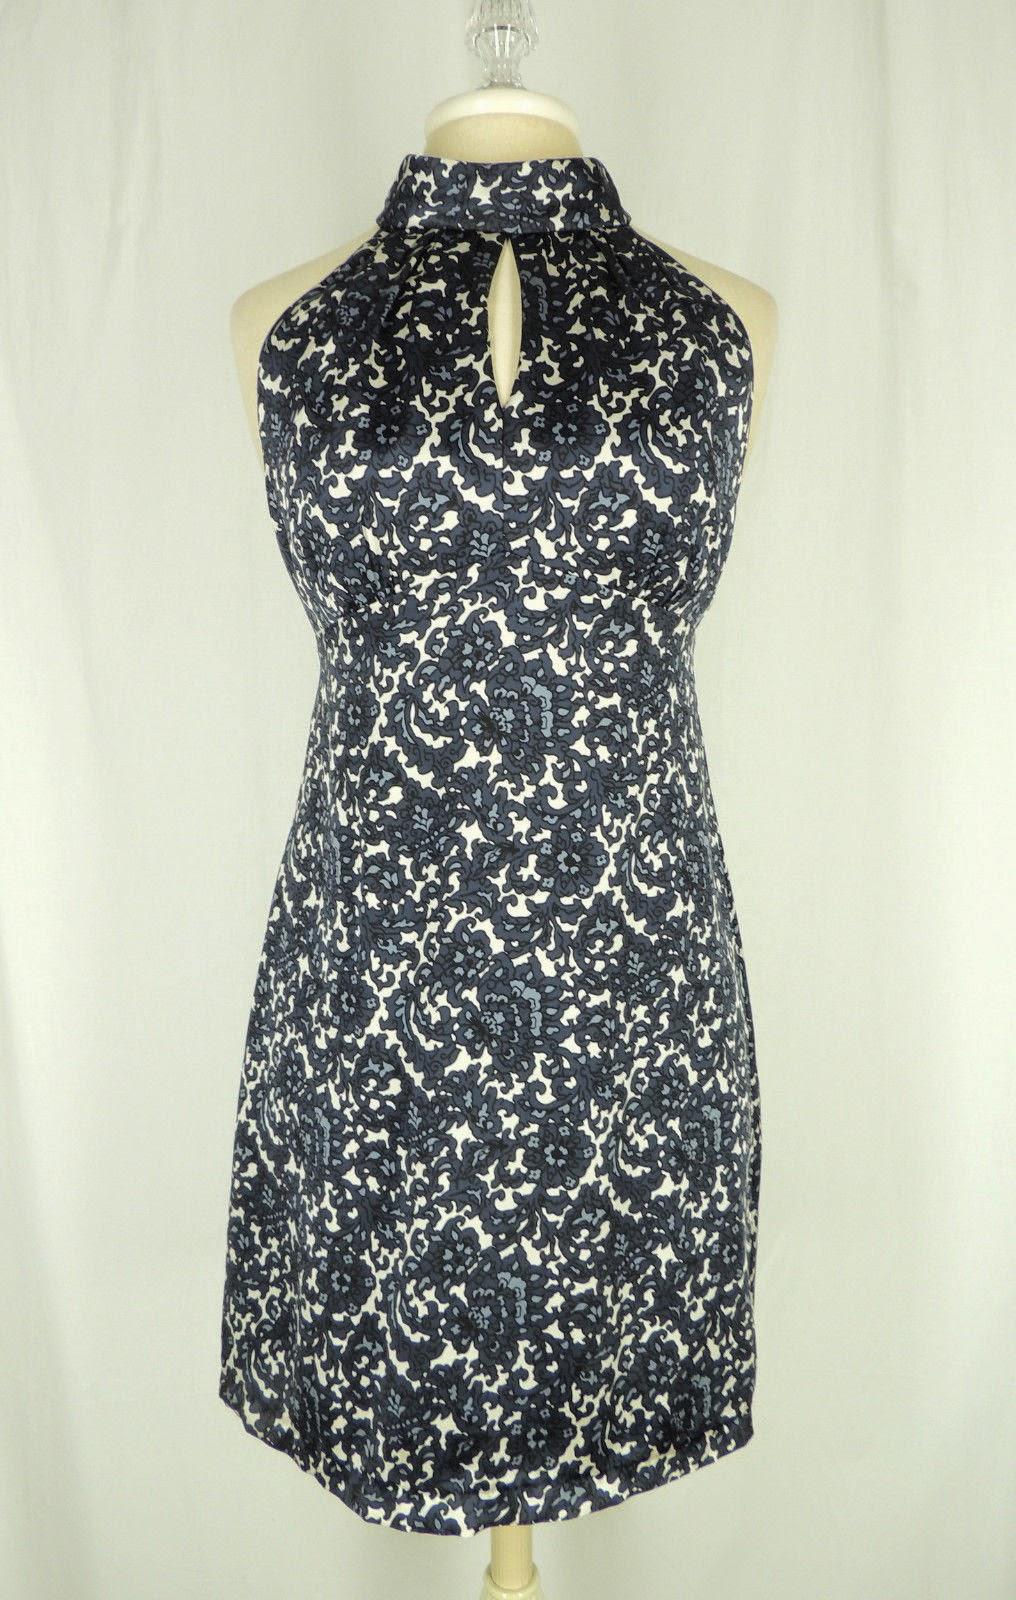 355d8cfff8 Monsoon Dresses Ebay Size 22